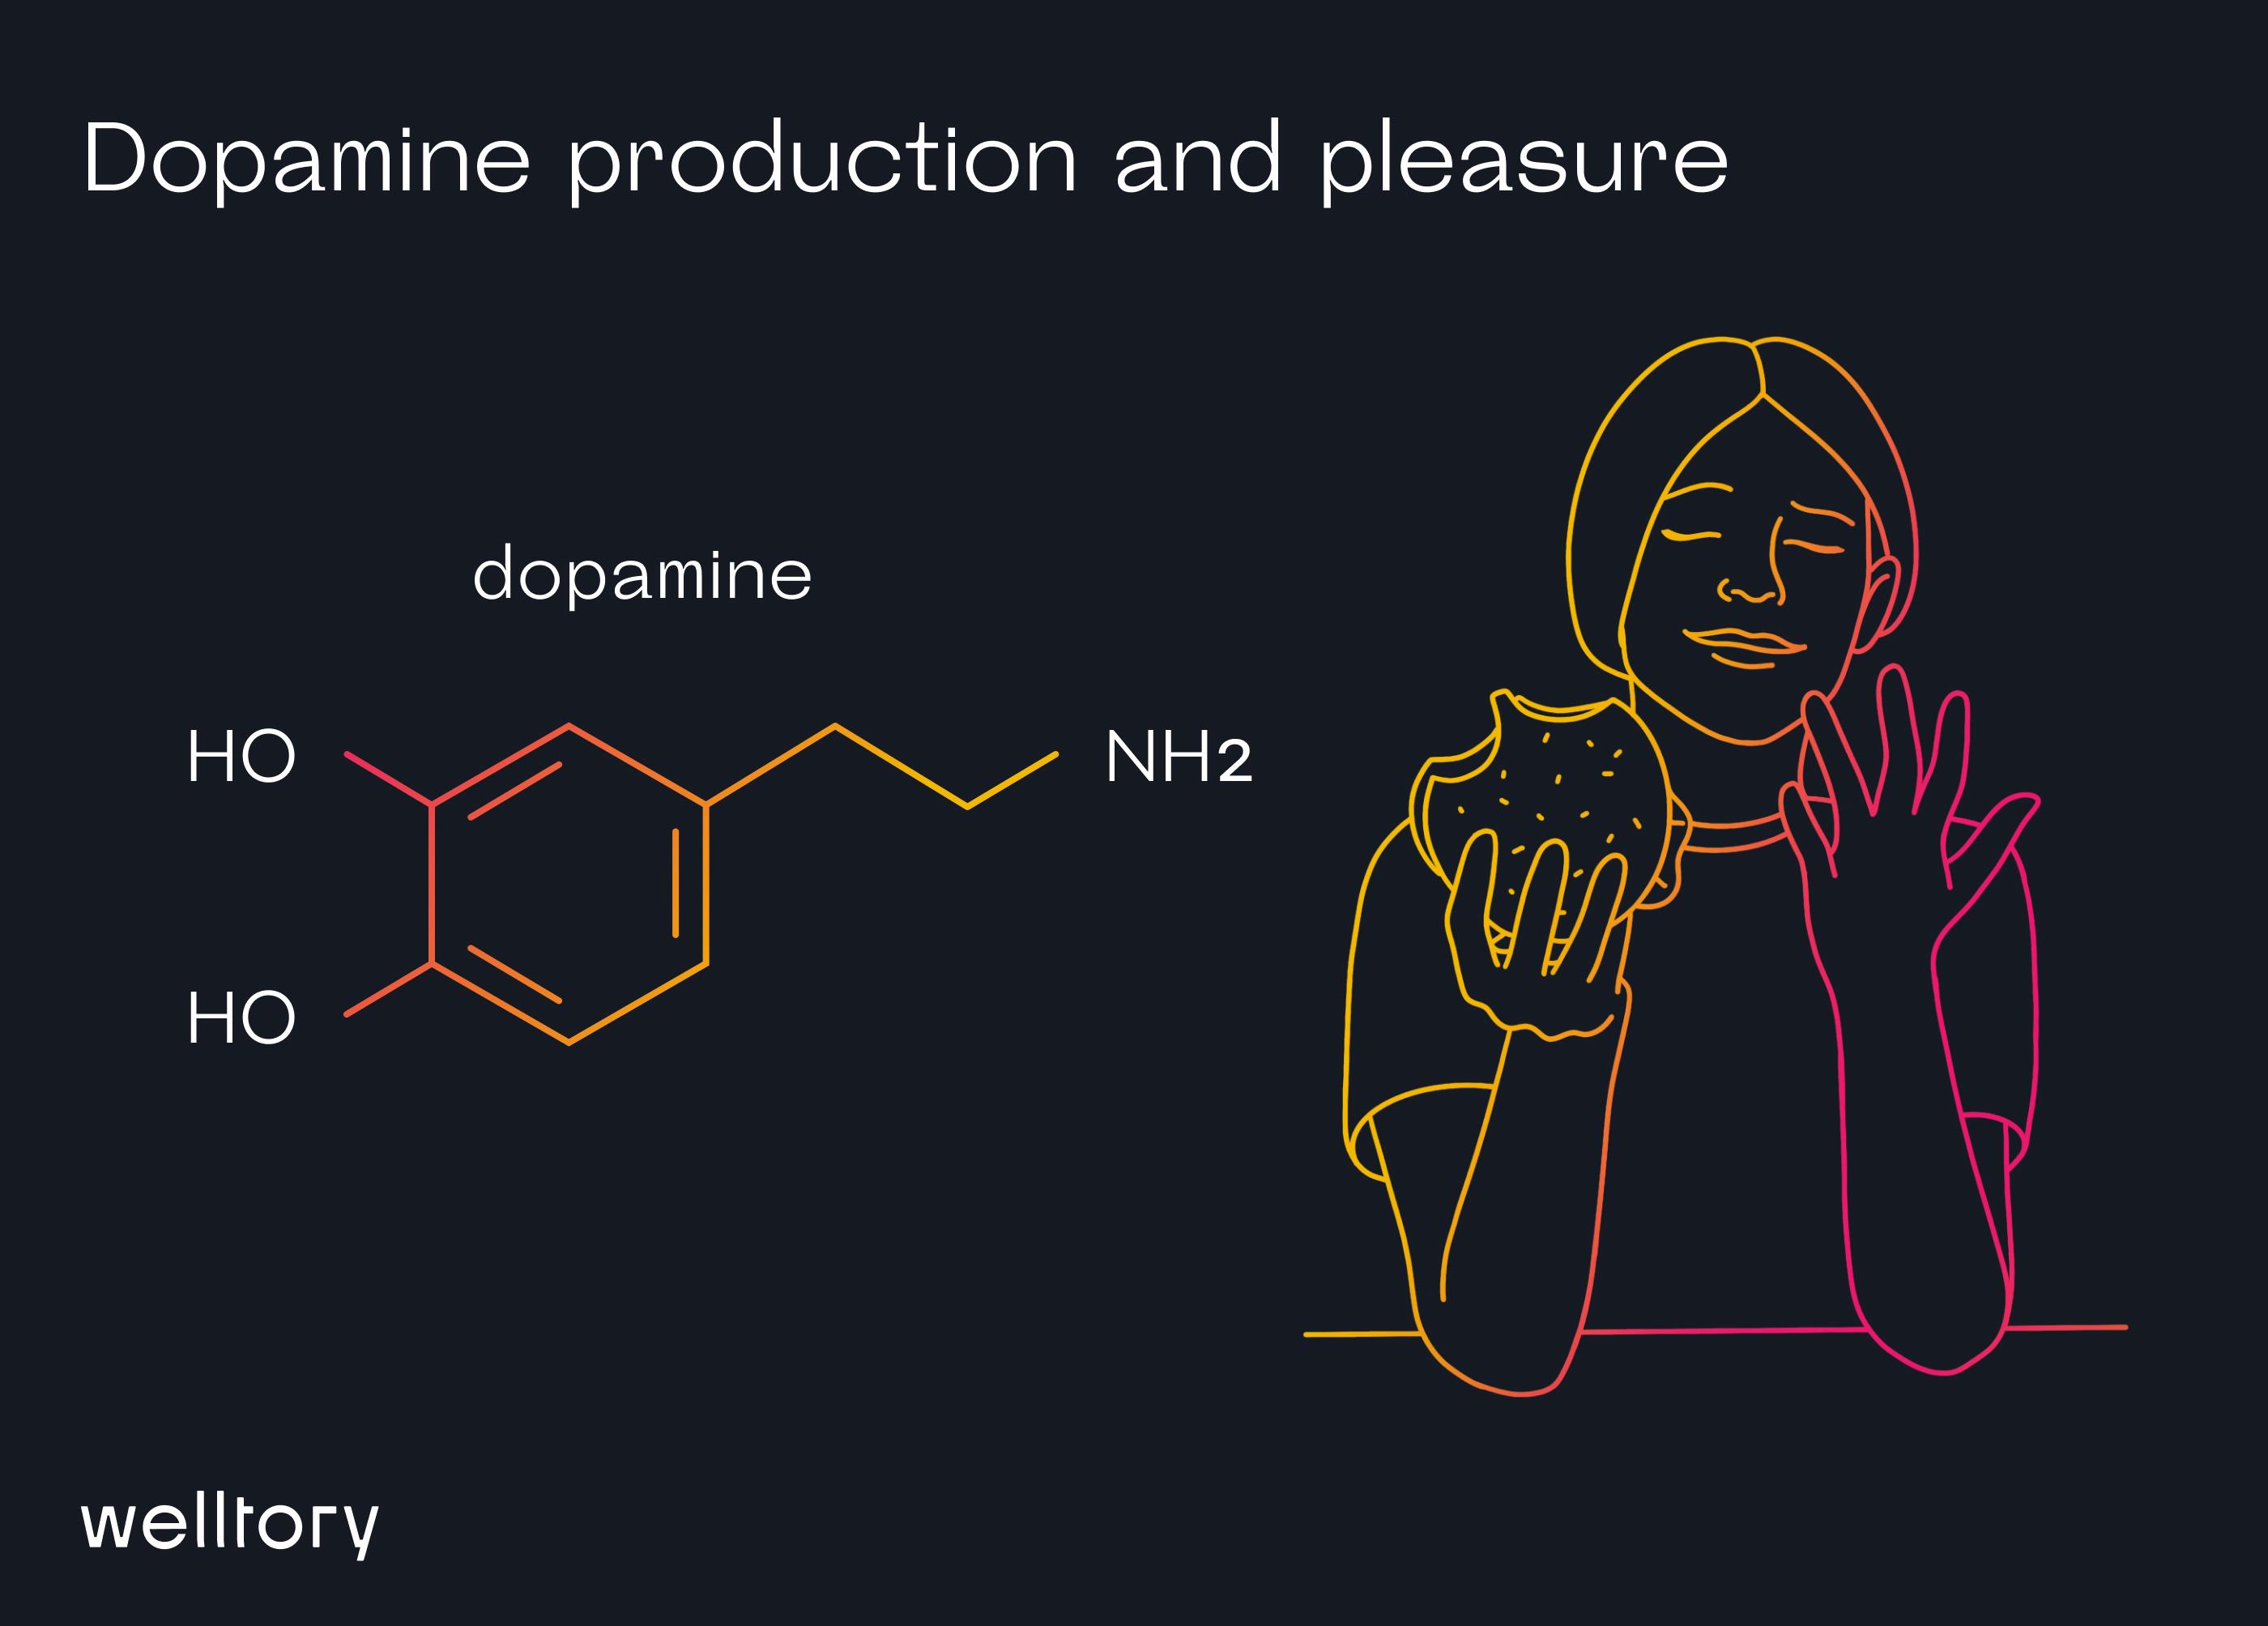 Dopamine production and pleasure